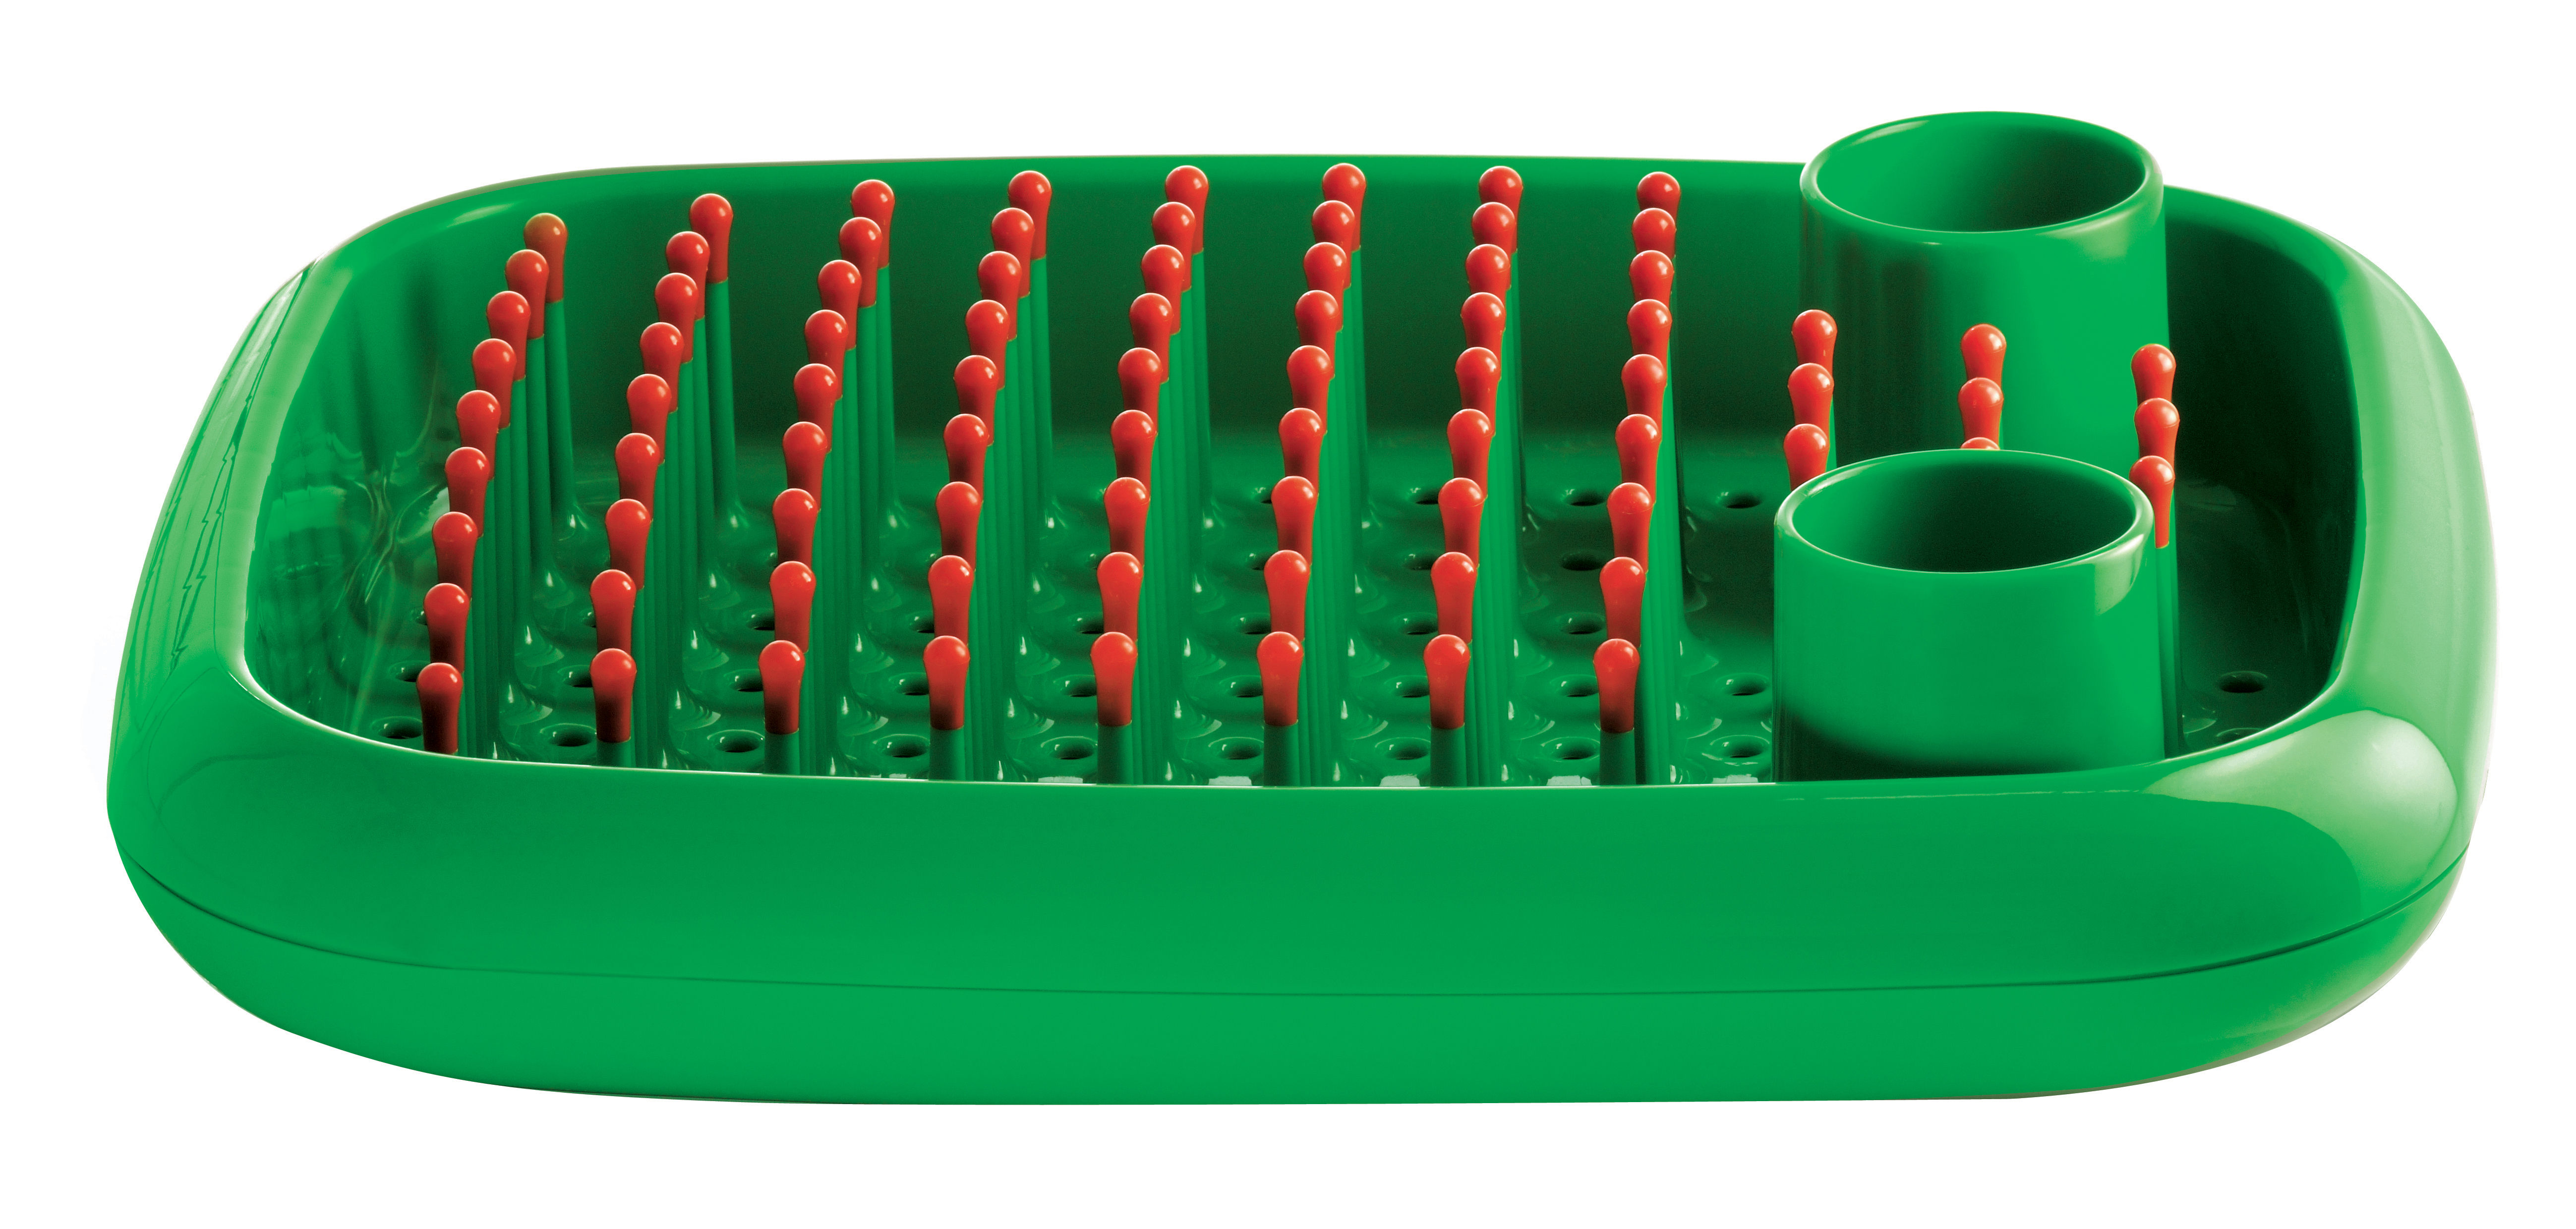 Kitchenware - Fun in the kitchen - Dish doctor Draining rack by Magis - Green - orange - Polypropylene